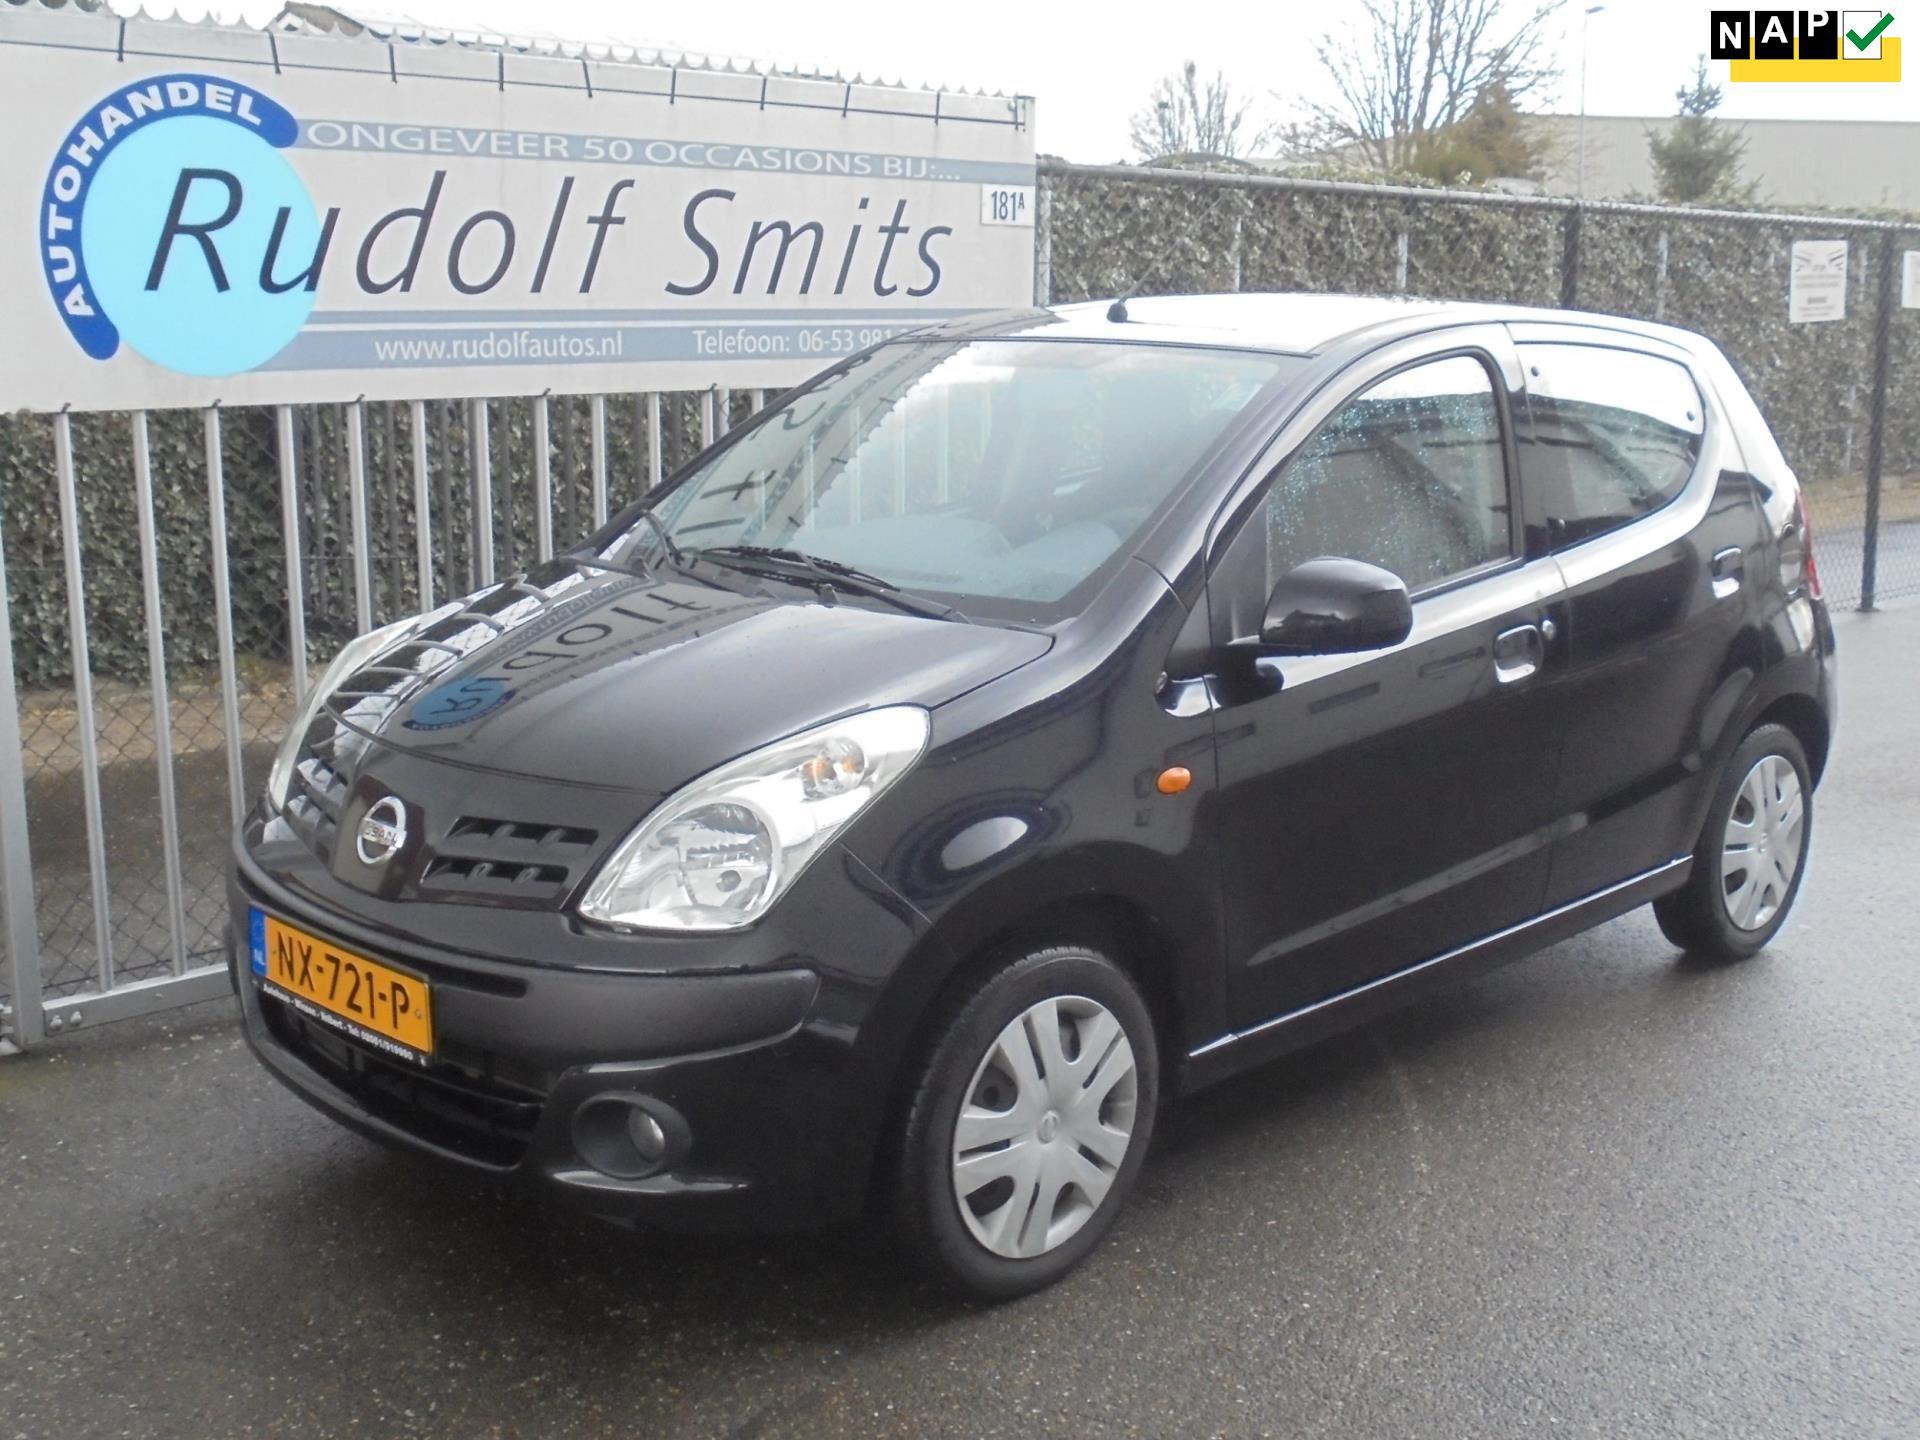 Nissan Pixo occasion - Autohandel Rudolf Smits